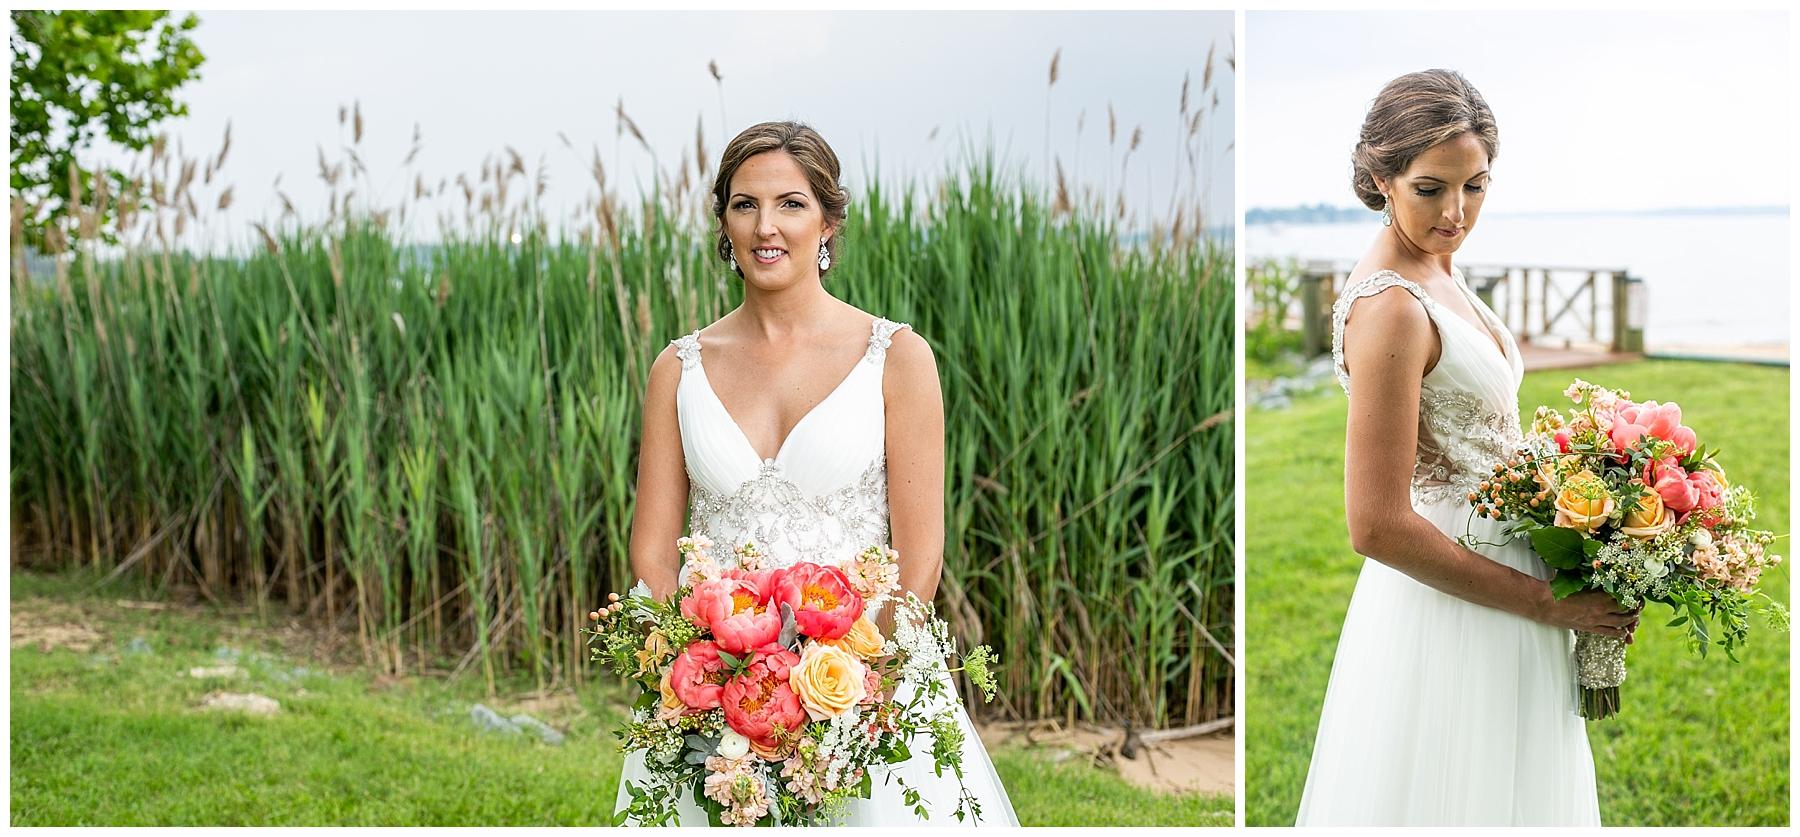 Chelsea Phil Bohemia River Overlook Wedding Living Radiant Photography photos_0049.jpg